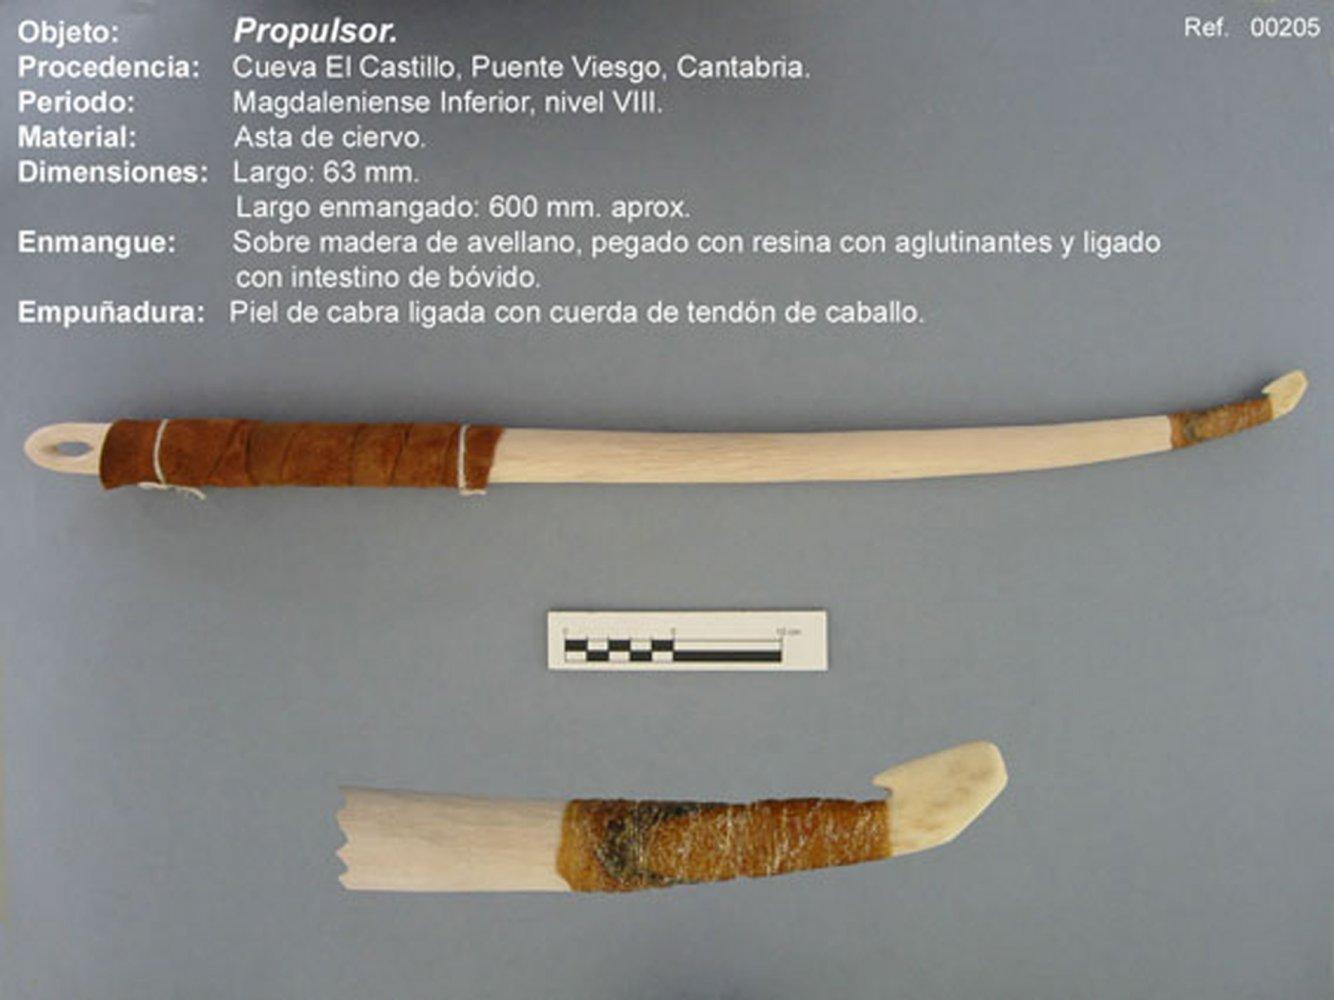 00205 Propulsor. El Castillo